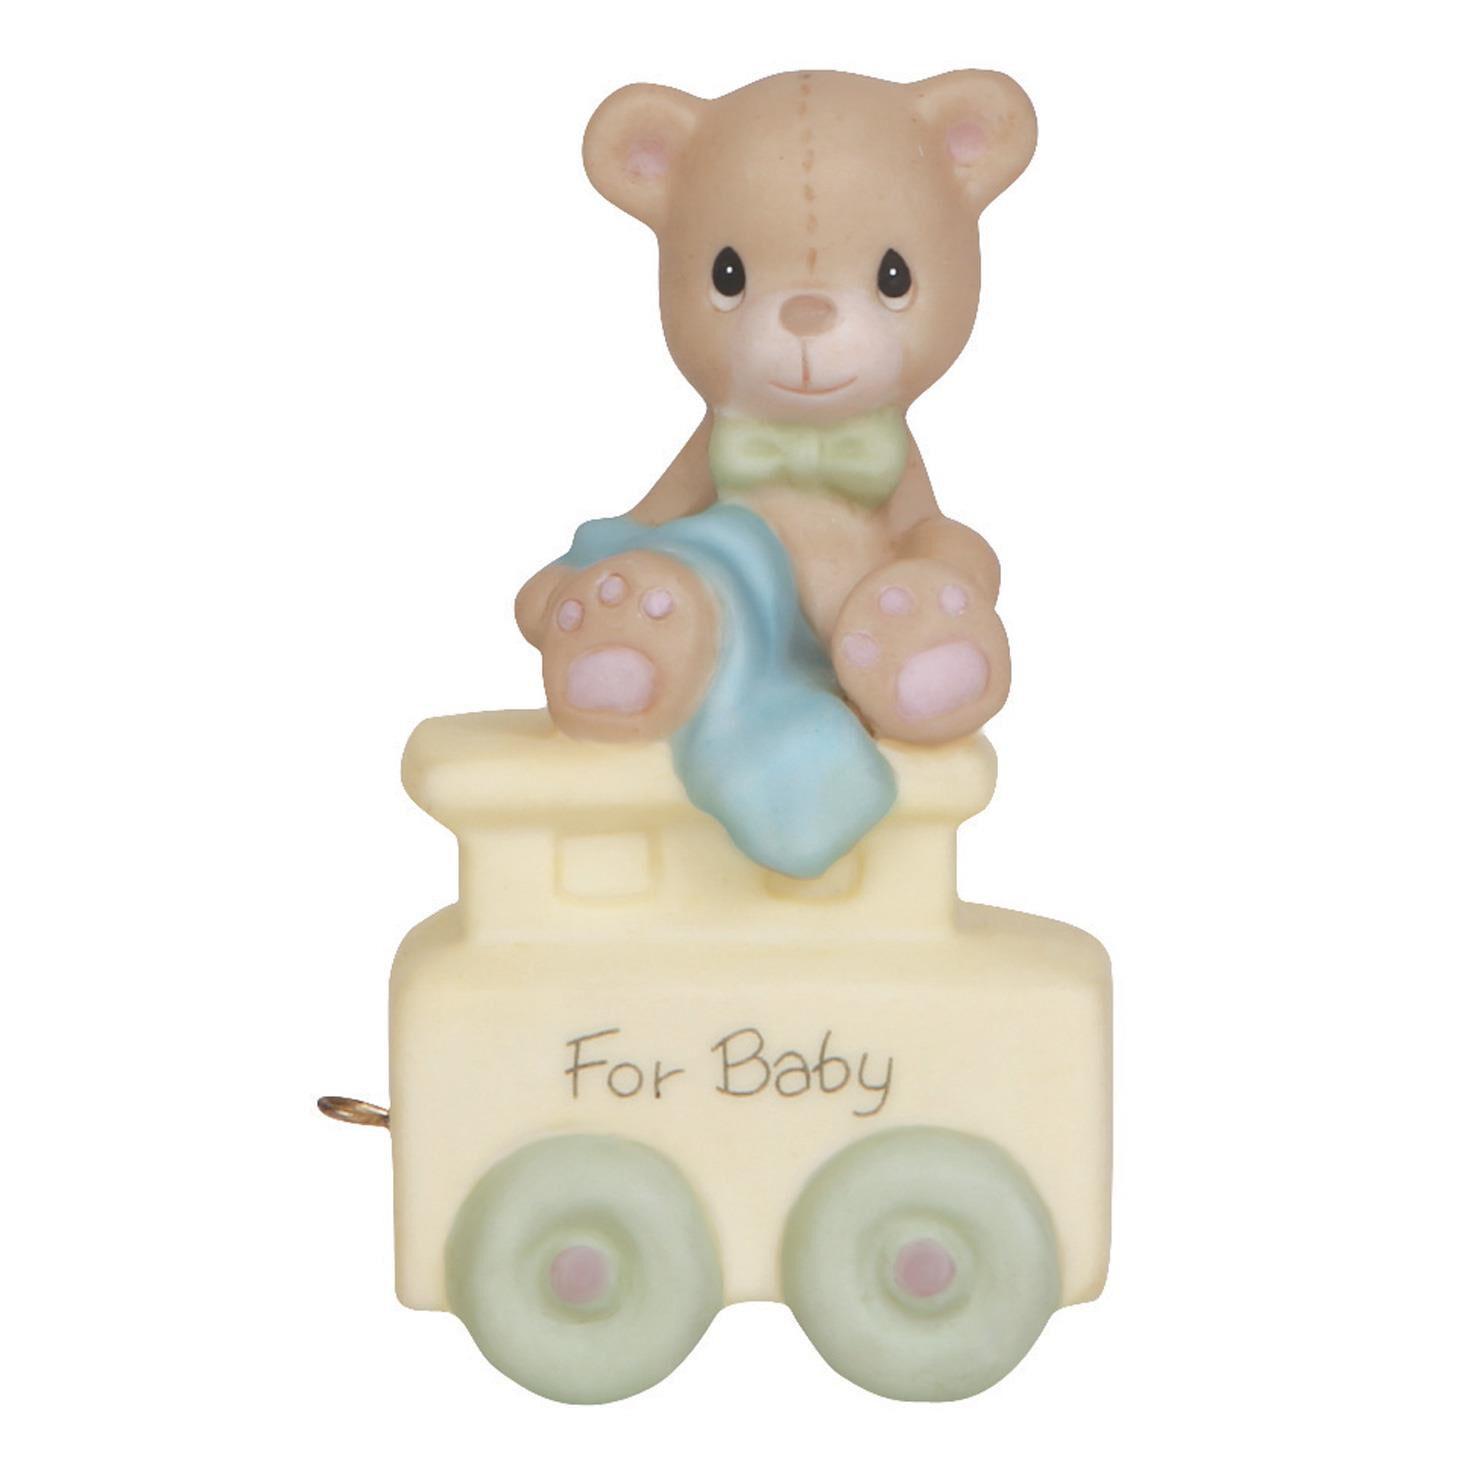 precious moments new baby teddy bear figurine figurines hallmark